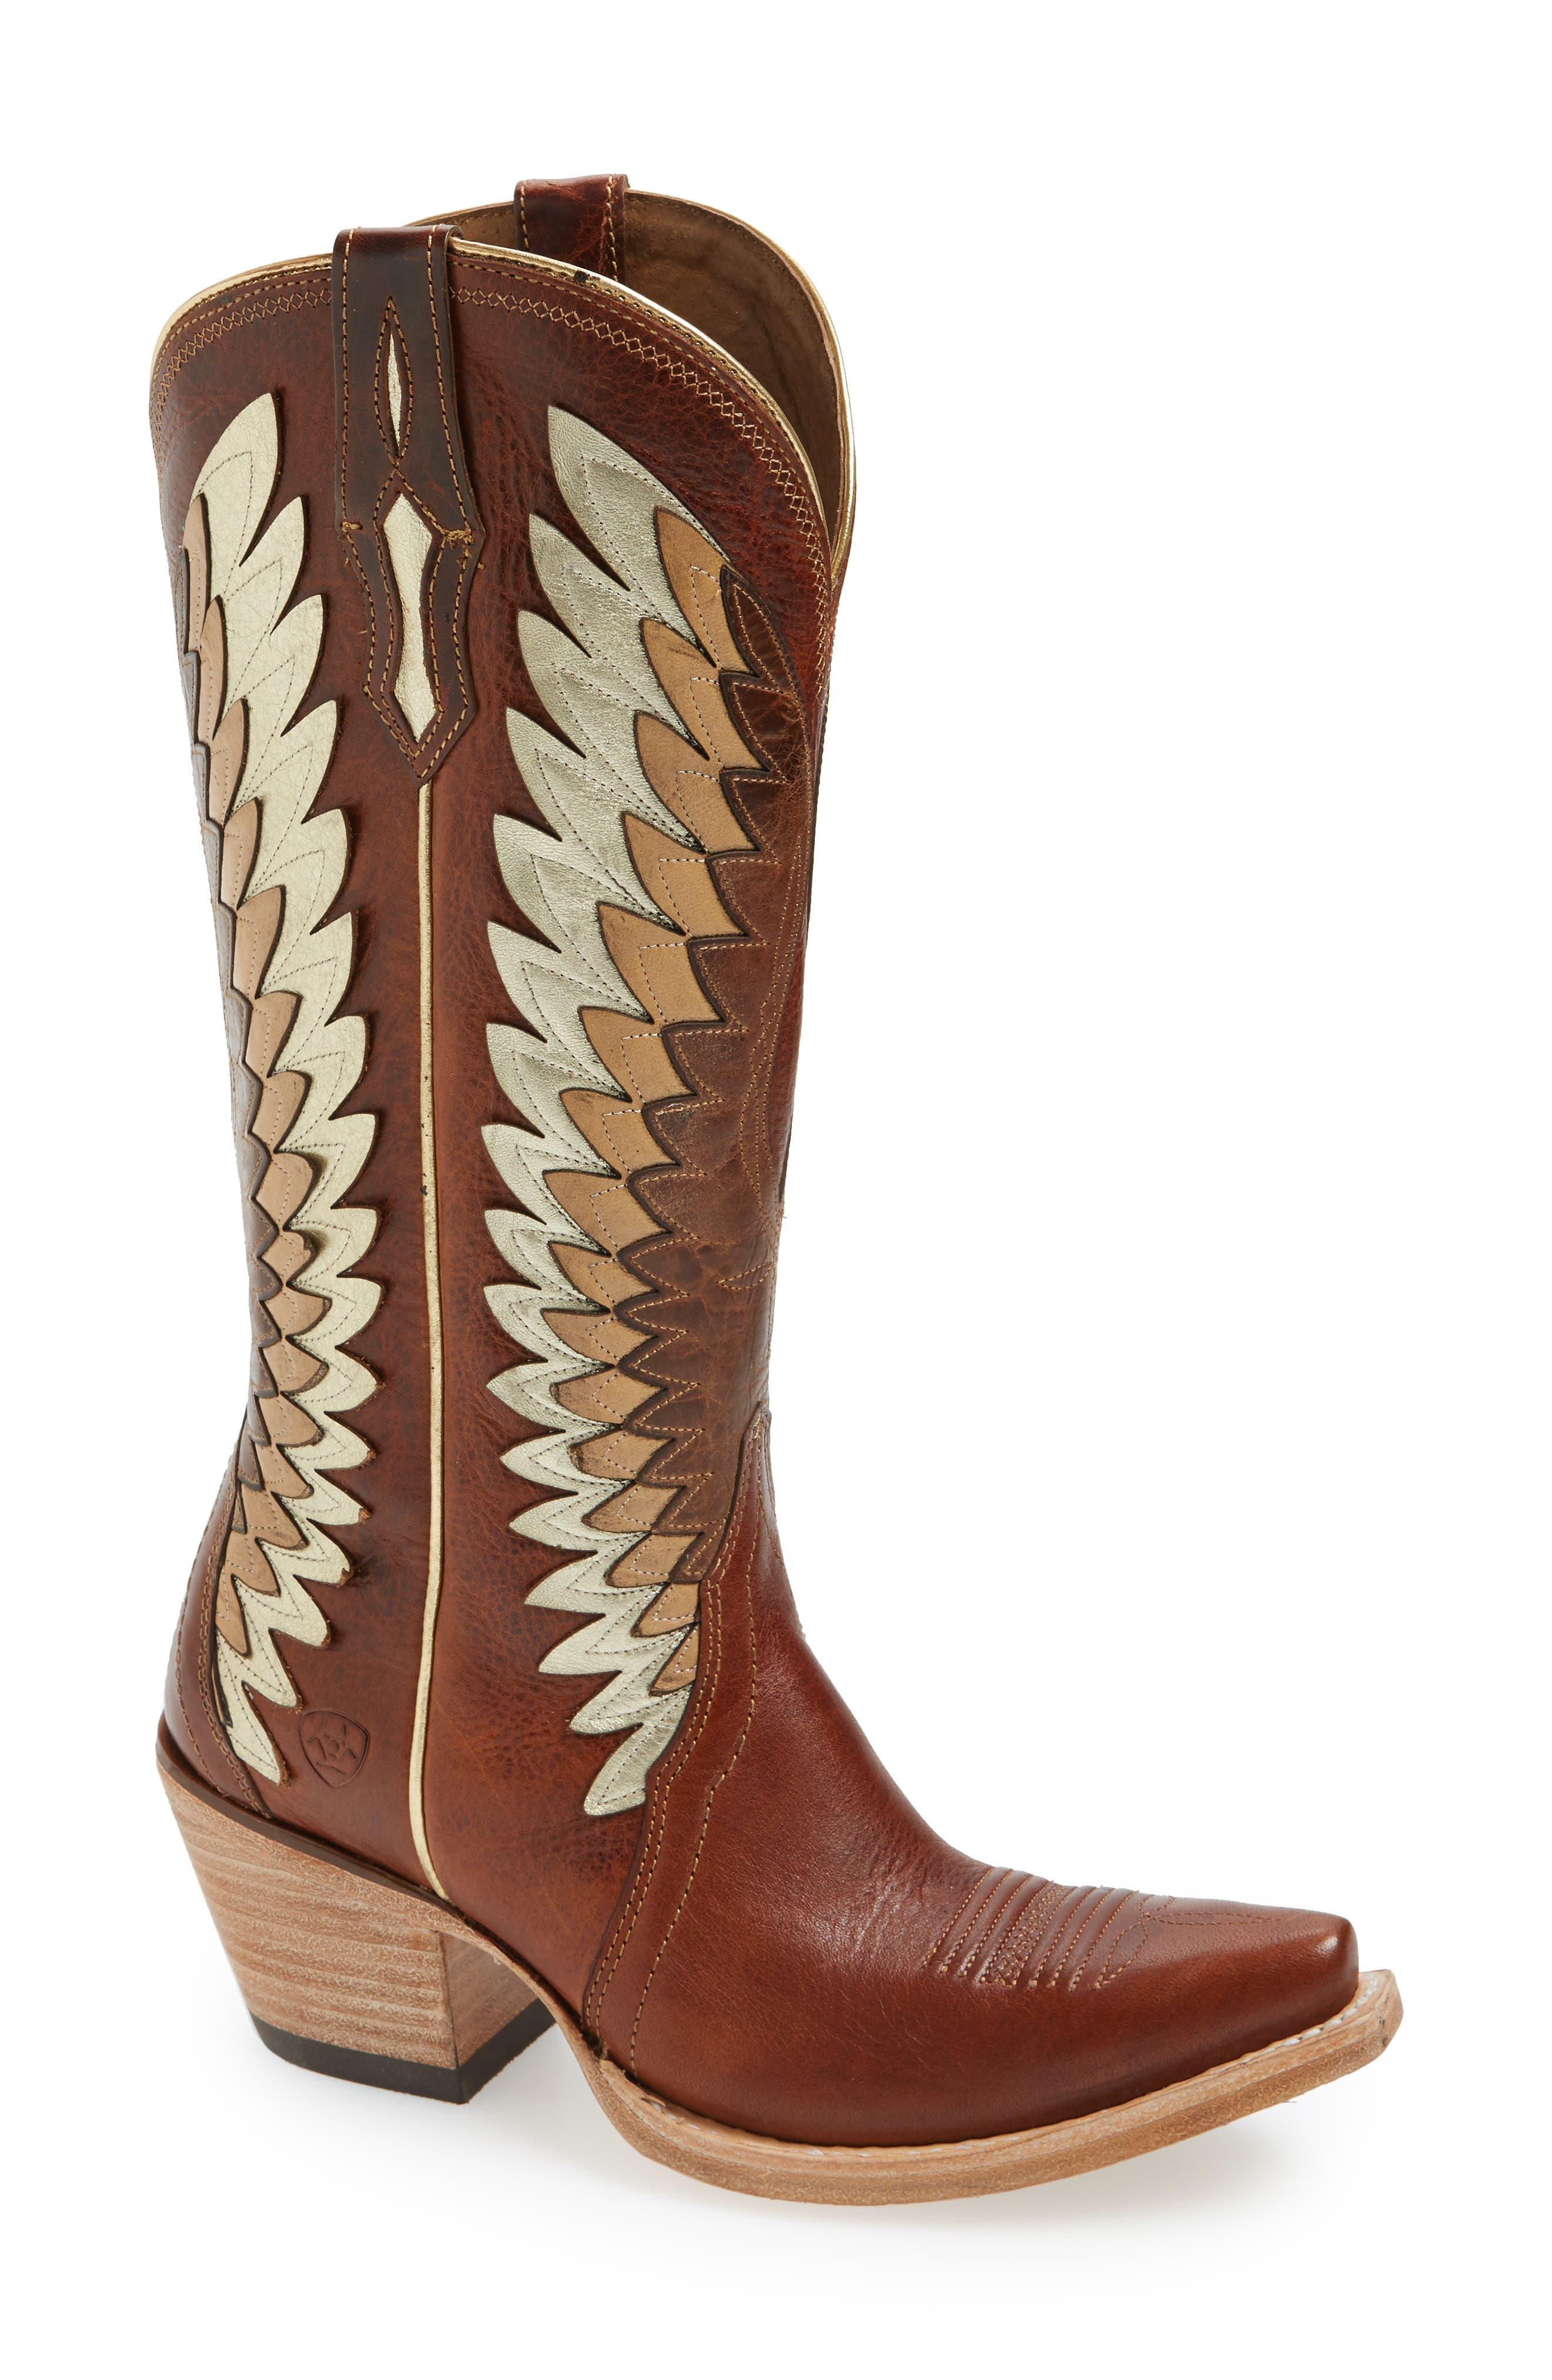 Alternate Image 1 Selected - Ariat Goldcrest Western Boot (Women)